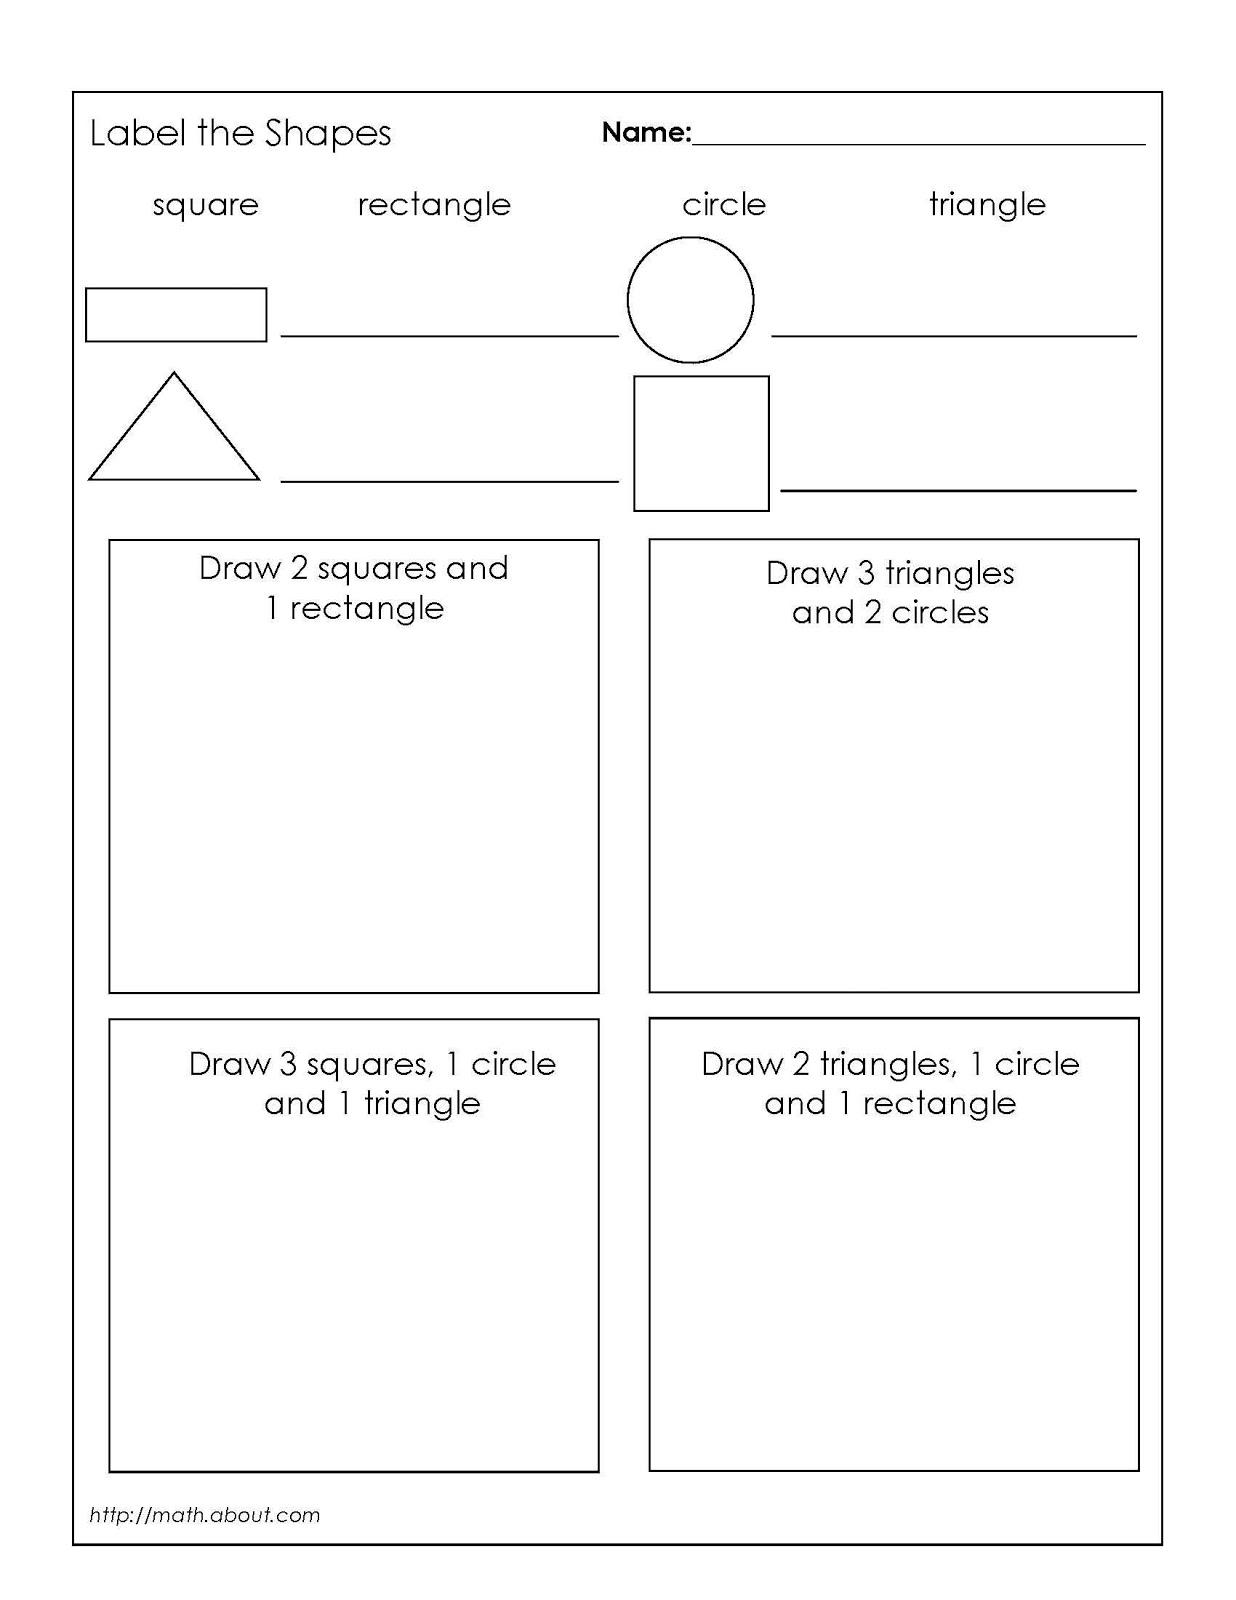 Mental maths worksheets ks2 – Mental Maths Worksheets Ks3